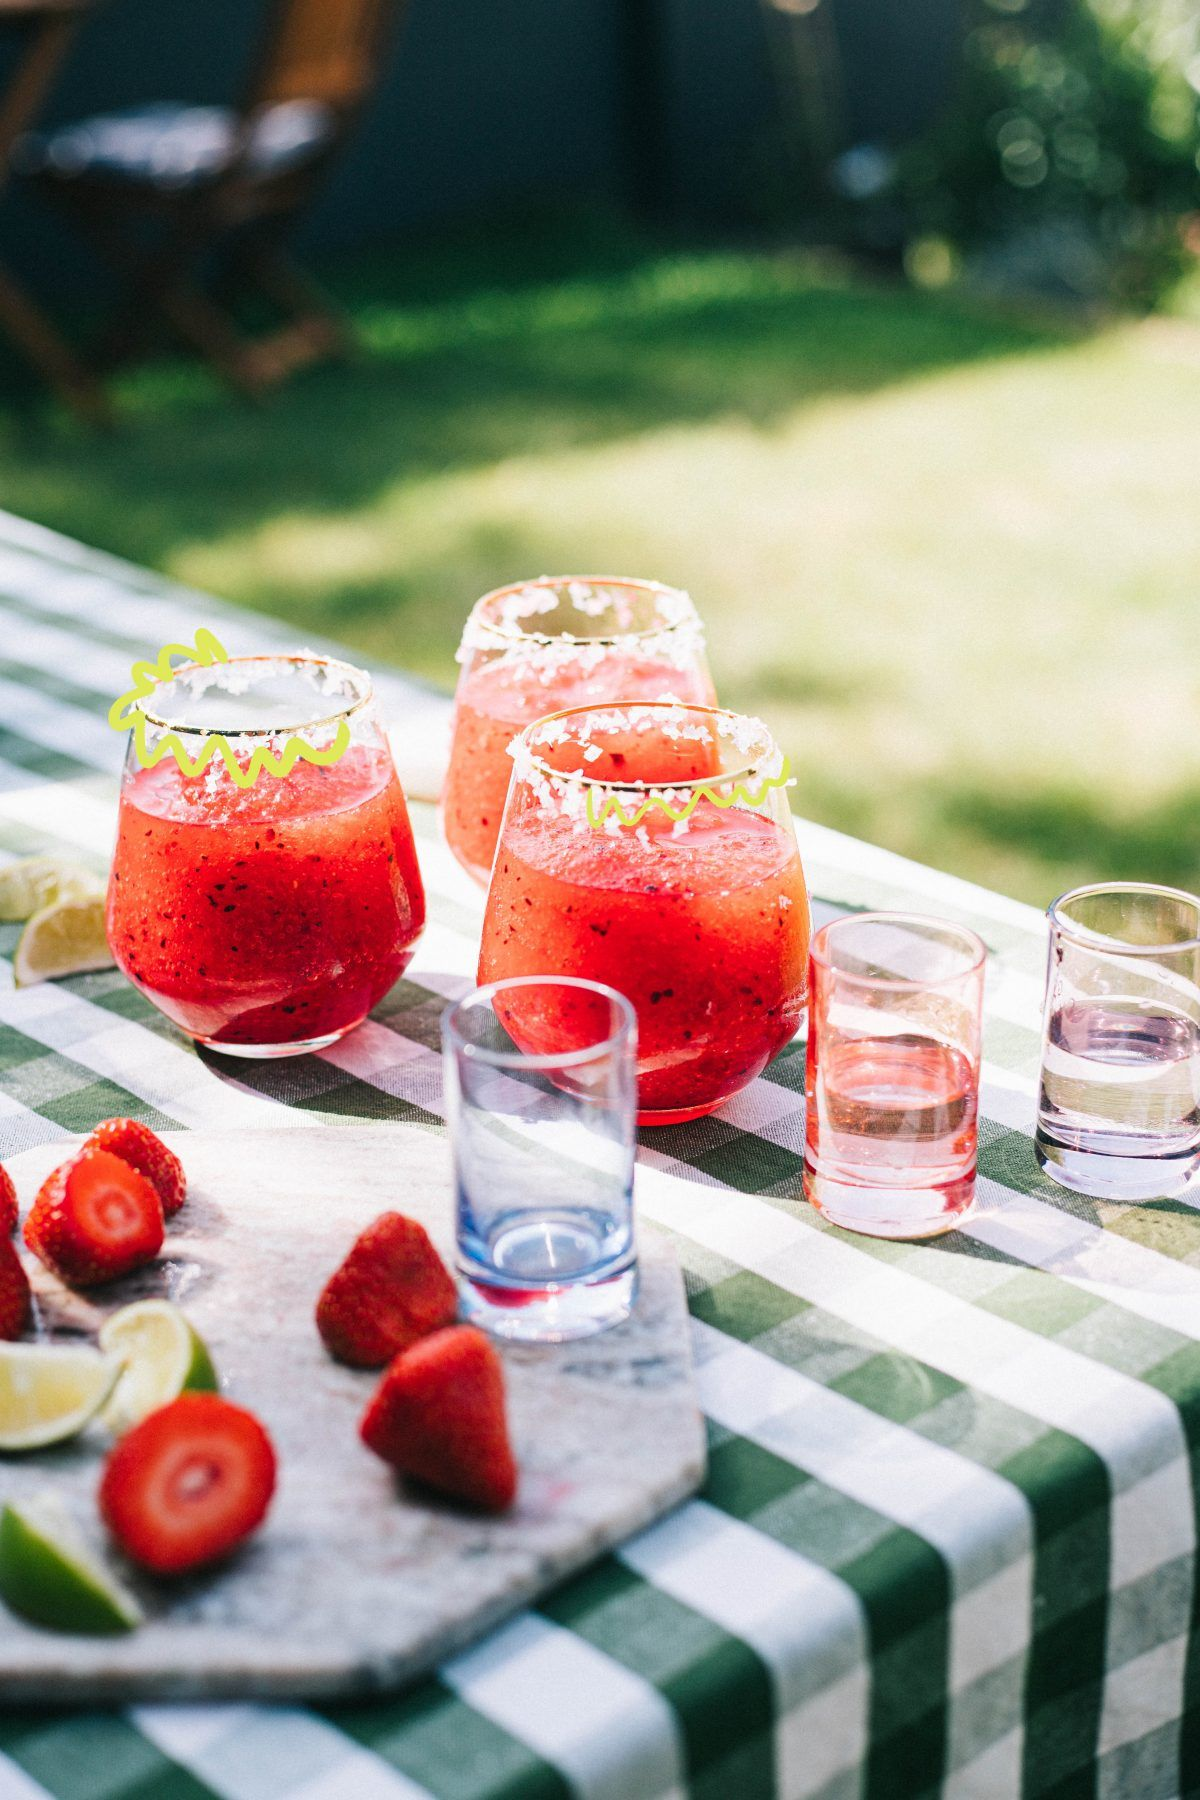 The Five Minute Frozen Margarita Recipe. – Poppy Deyes #frozenmargaritarecipes